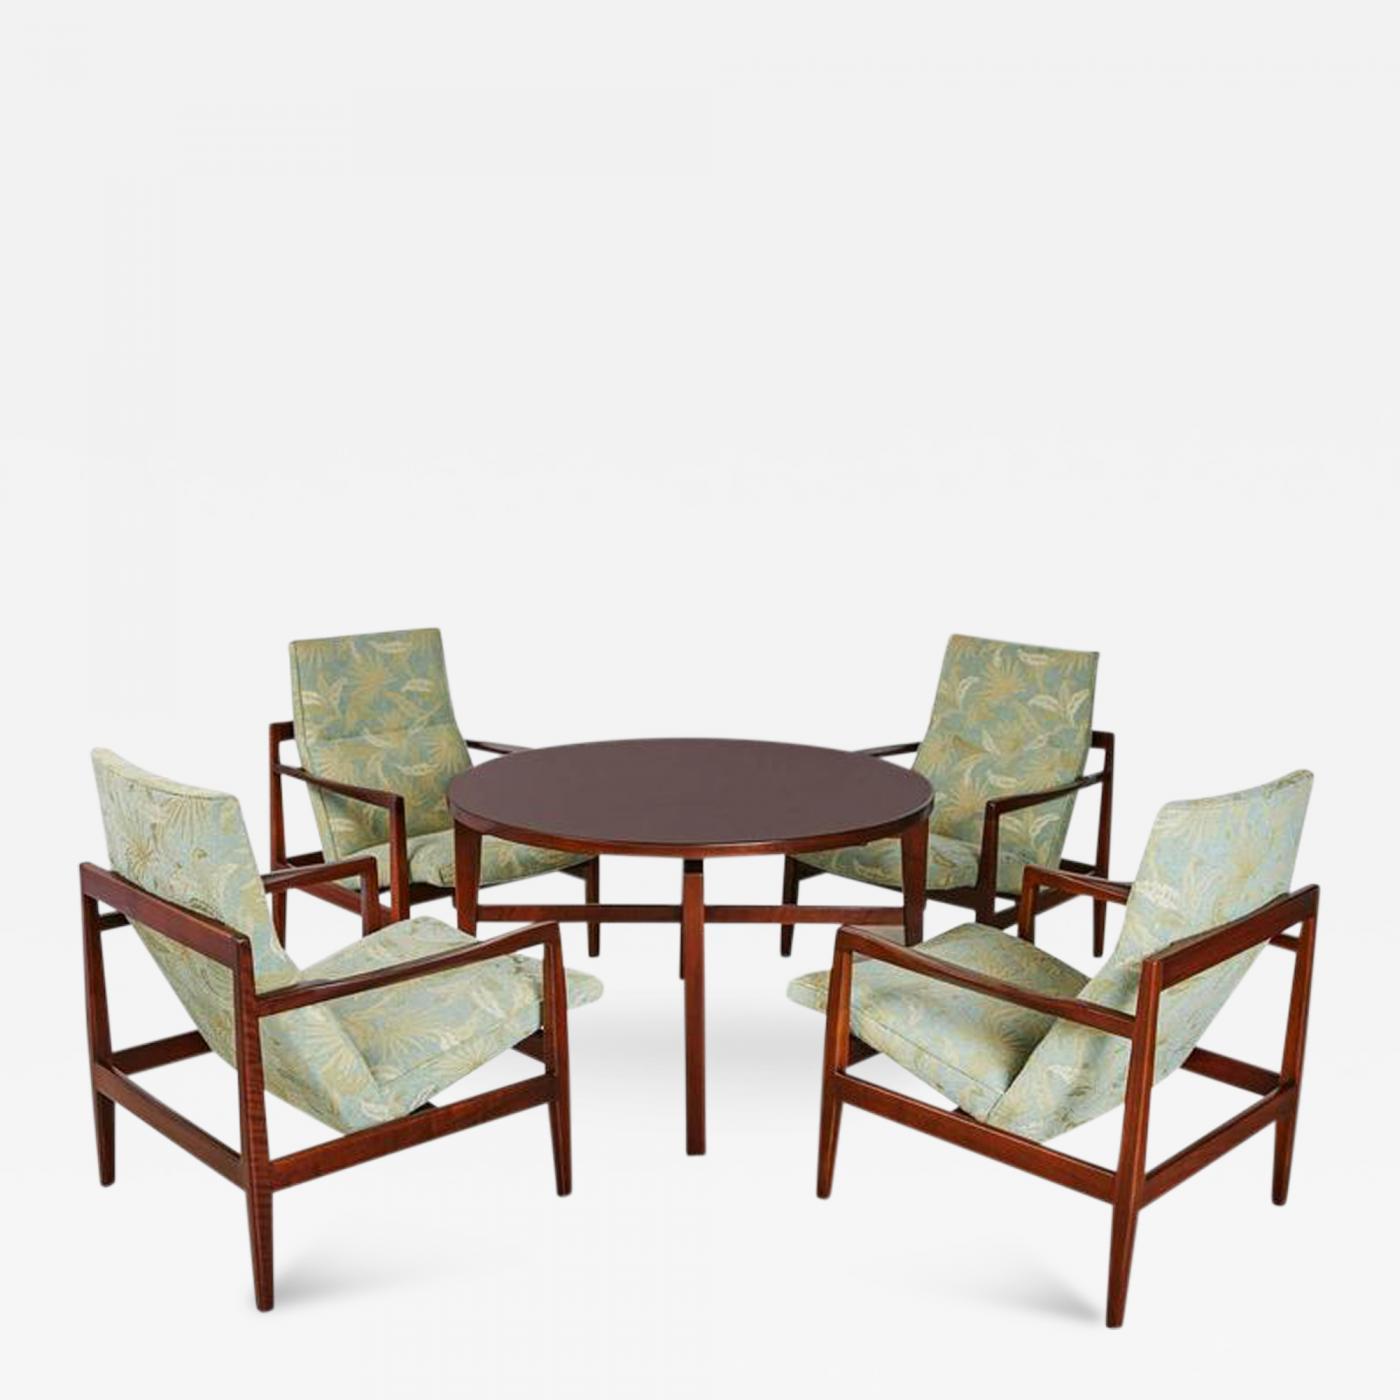 jens risom jens risom cocktail lounge set with revolving table